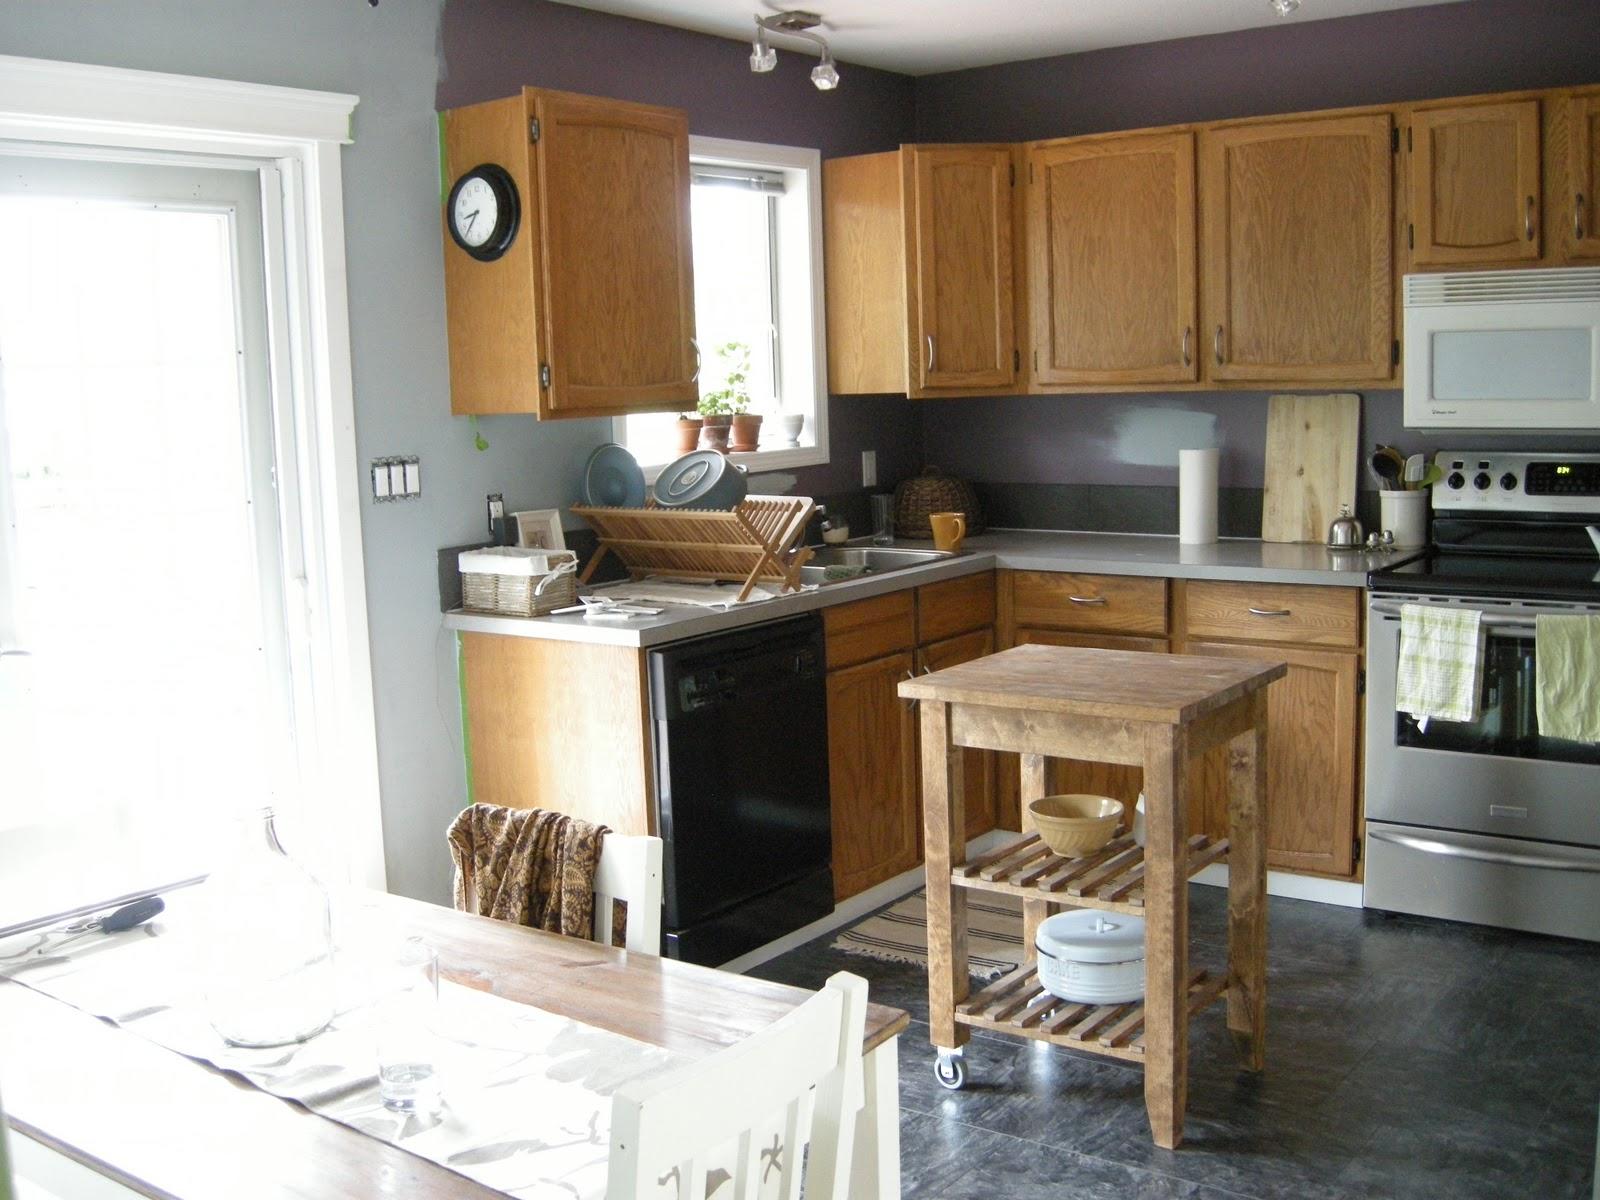 10 Decorating Ideas For A Gray Kitchen Walls Czytamwwannie S